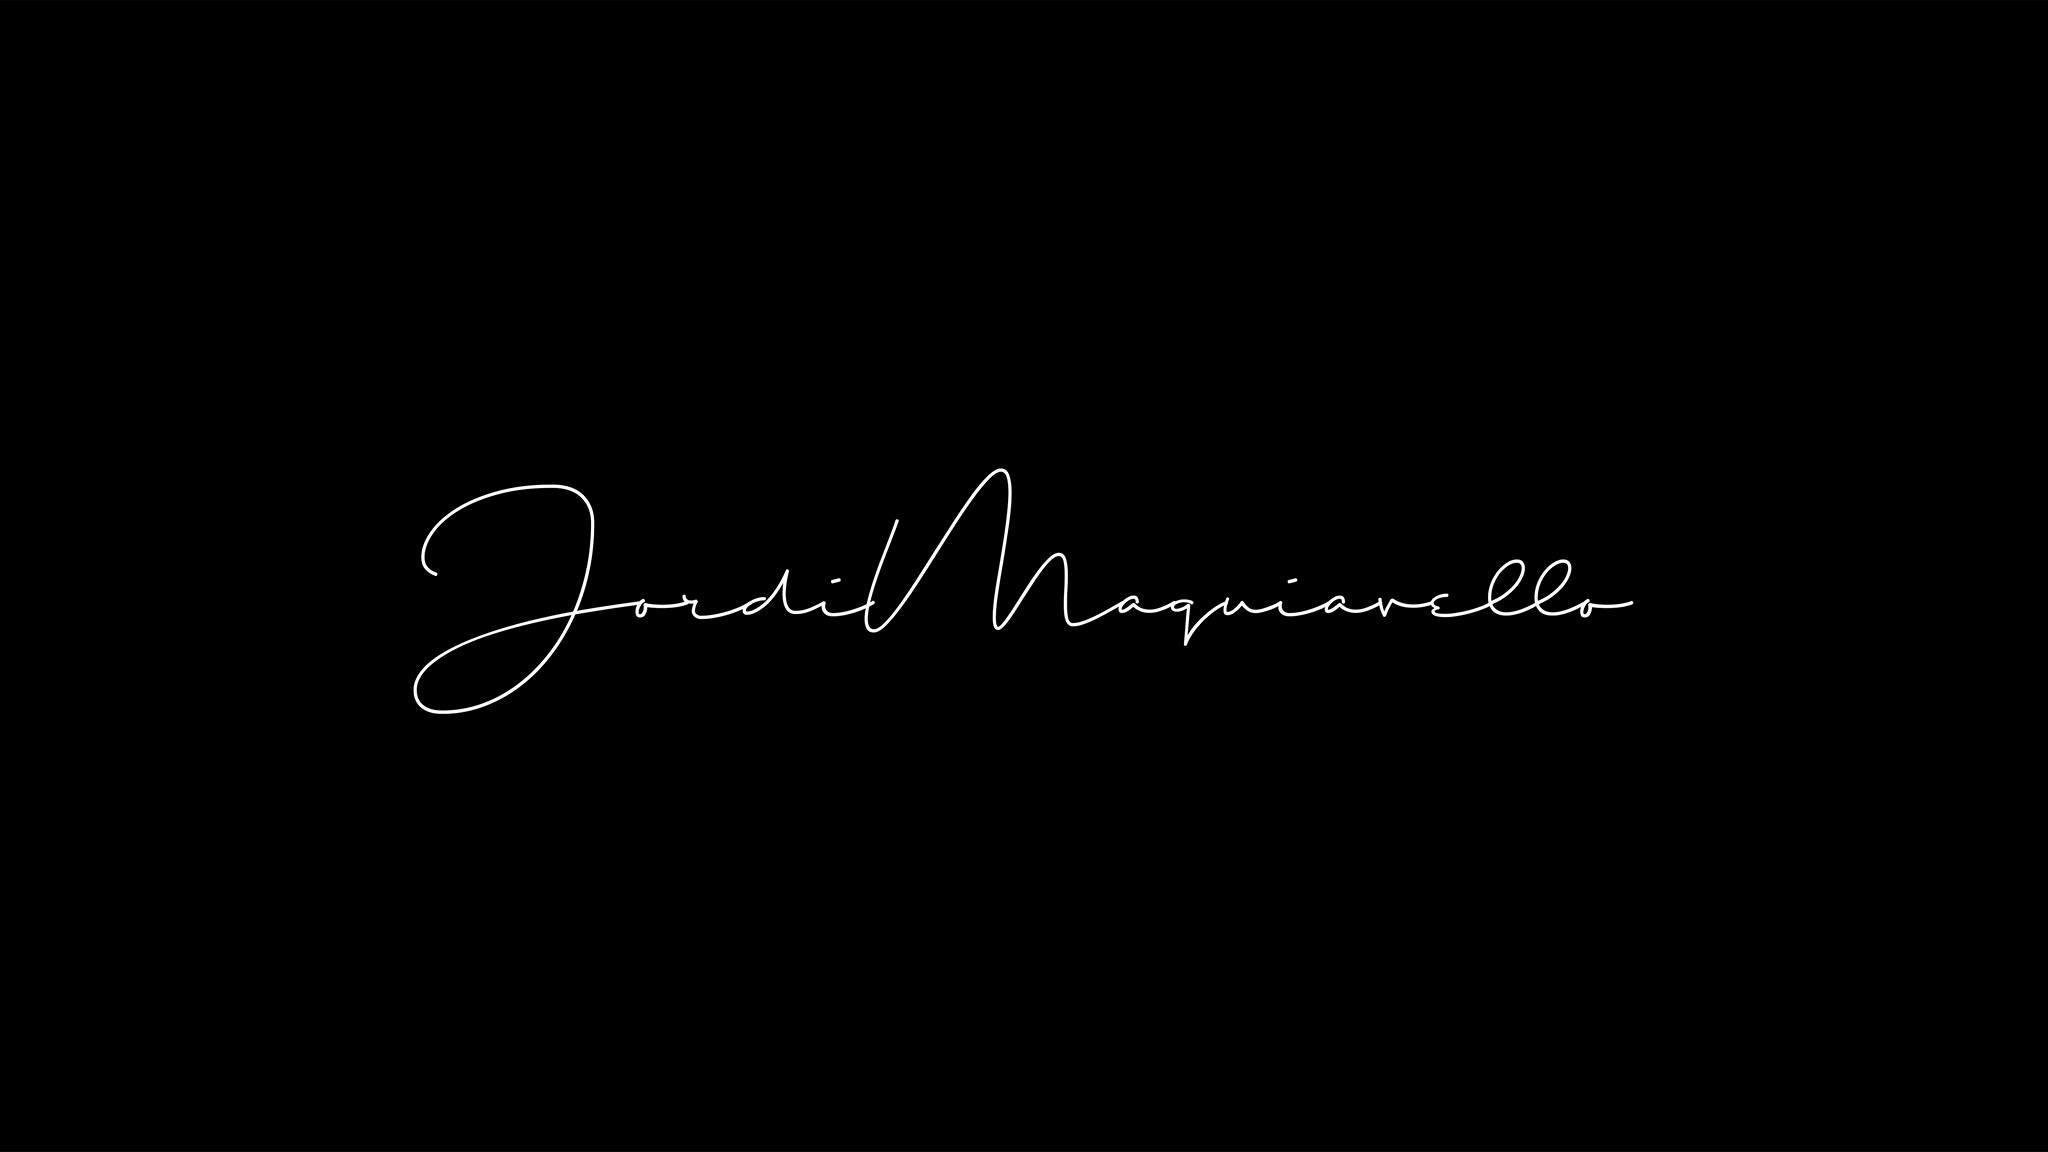 JordiMaquiavello